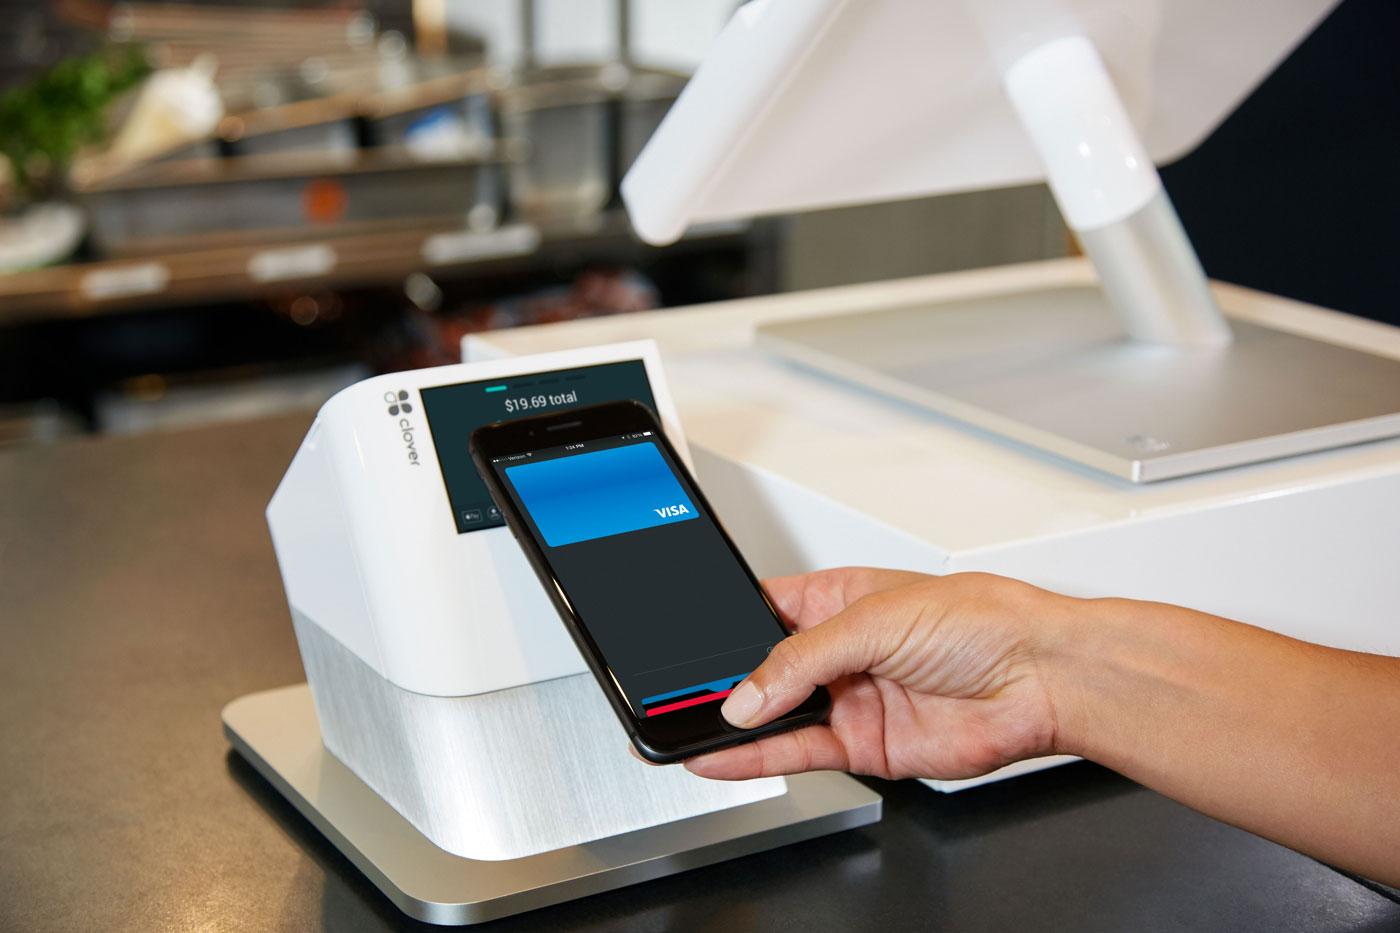 Making an NFC payment